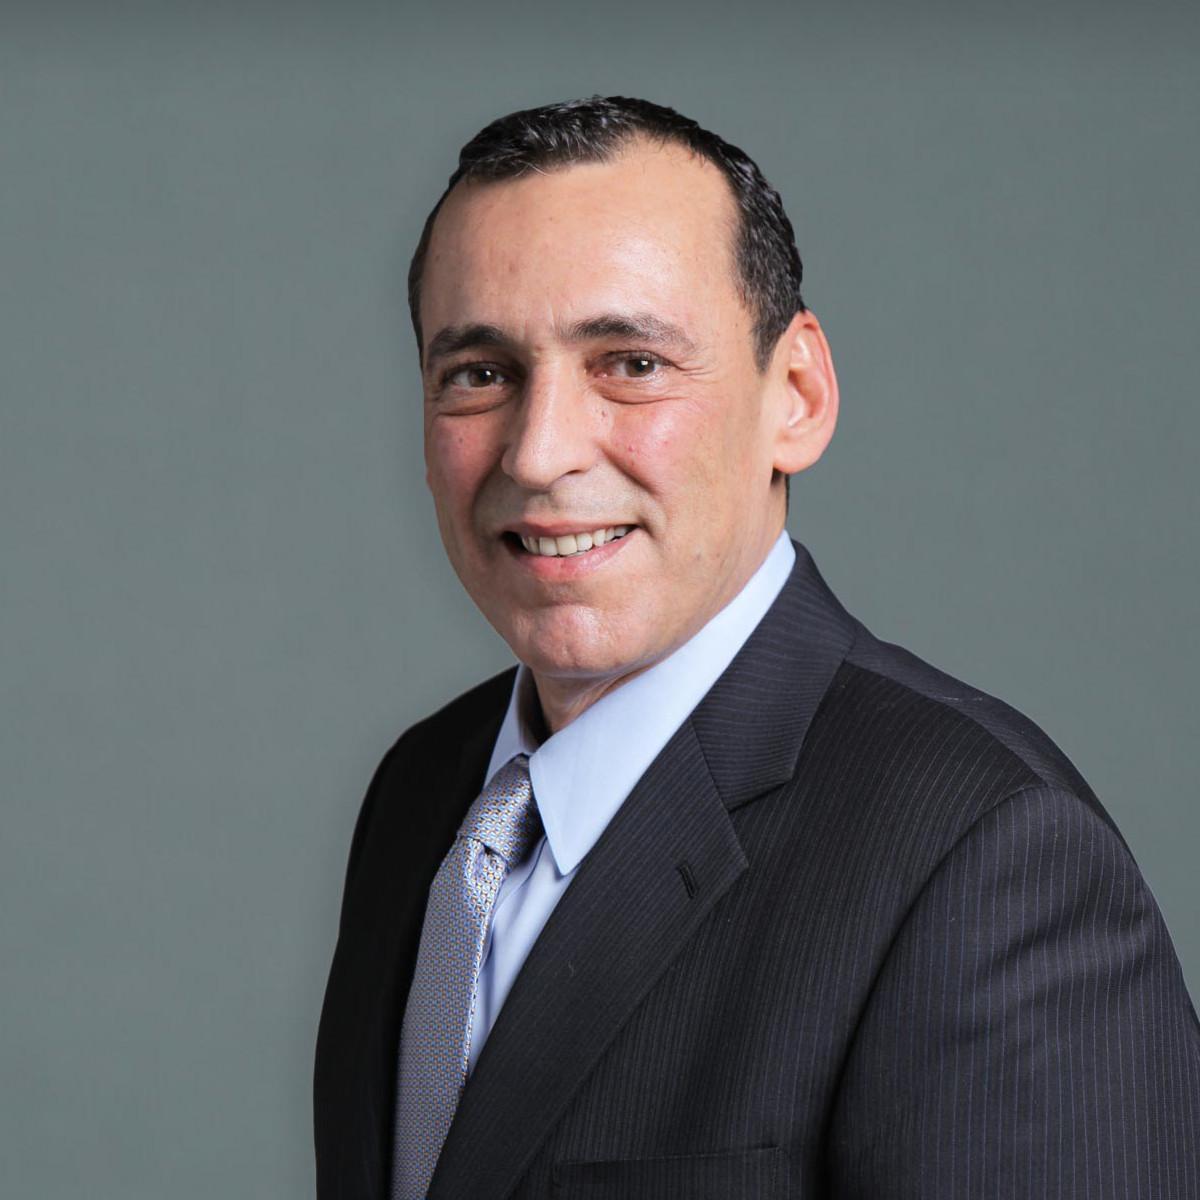 Michael A. Liguori | NYU Langone Health